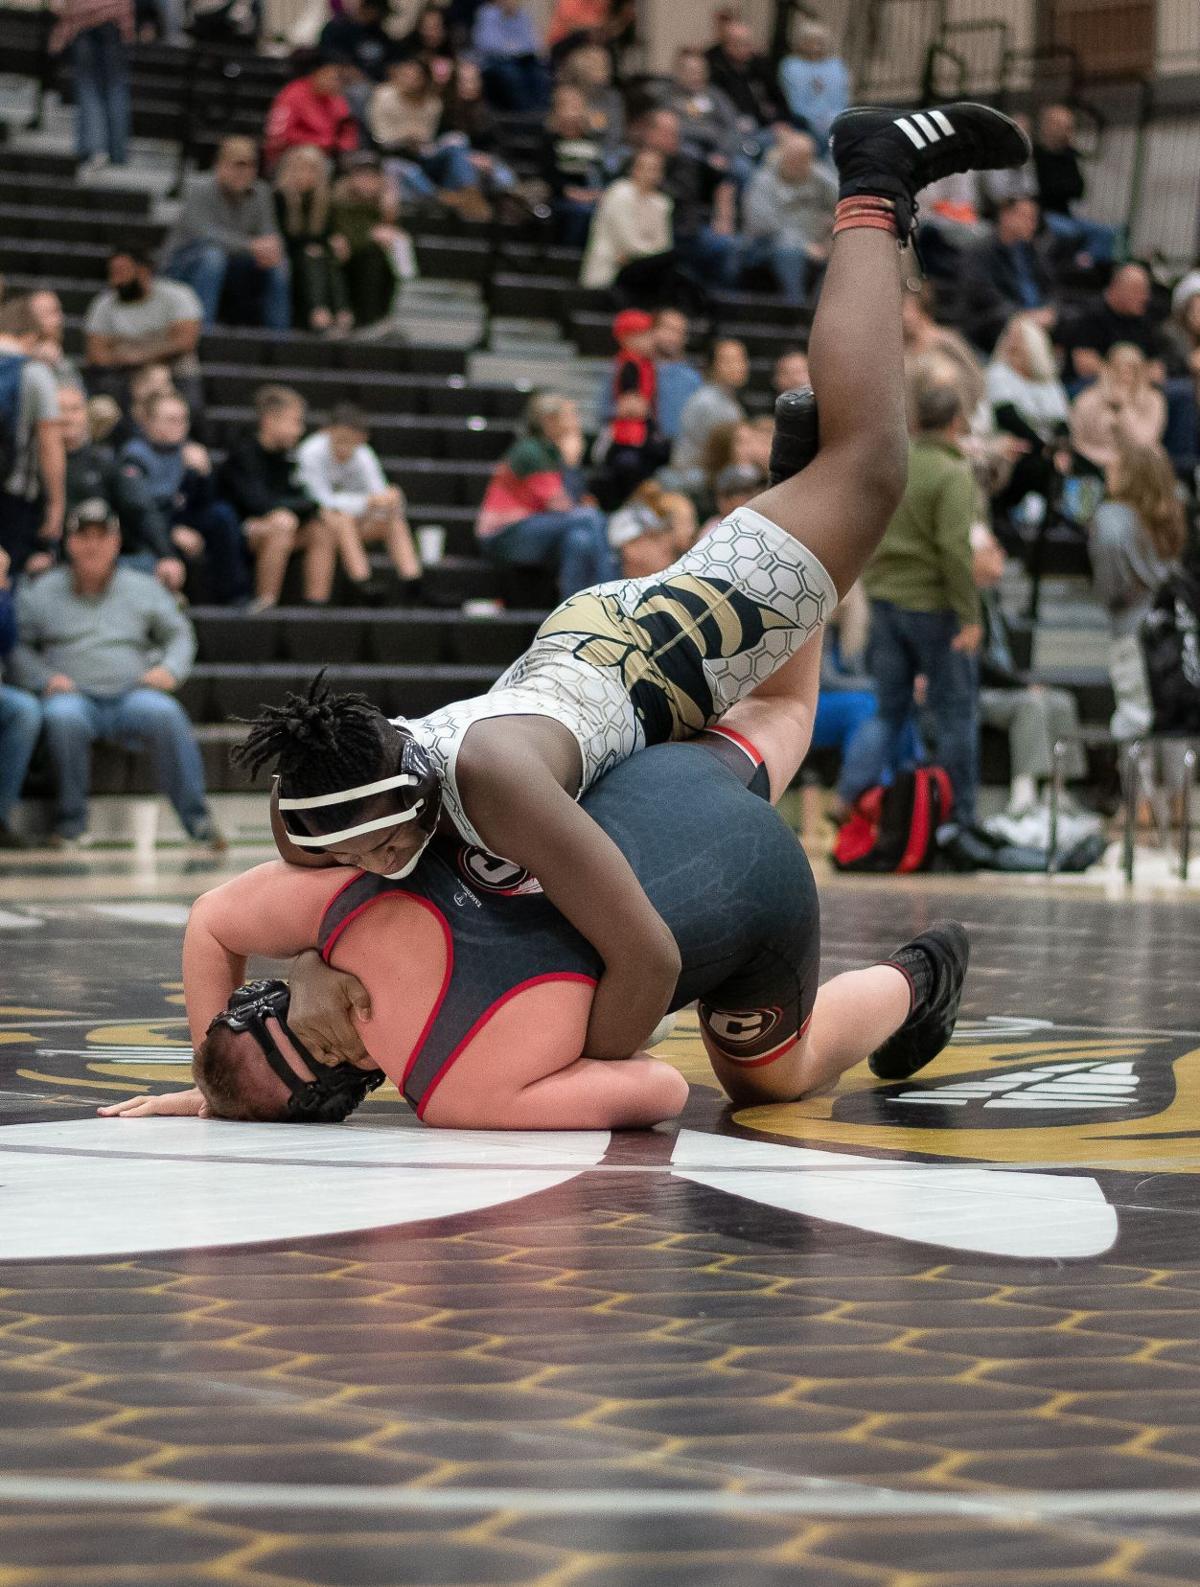 Calhoun Wrestling vs. Chattooga - Calhoun High School (Jan. 8)